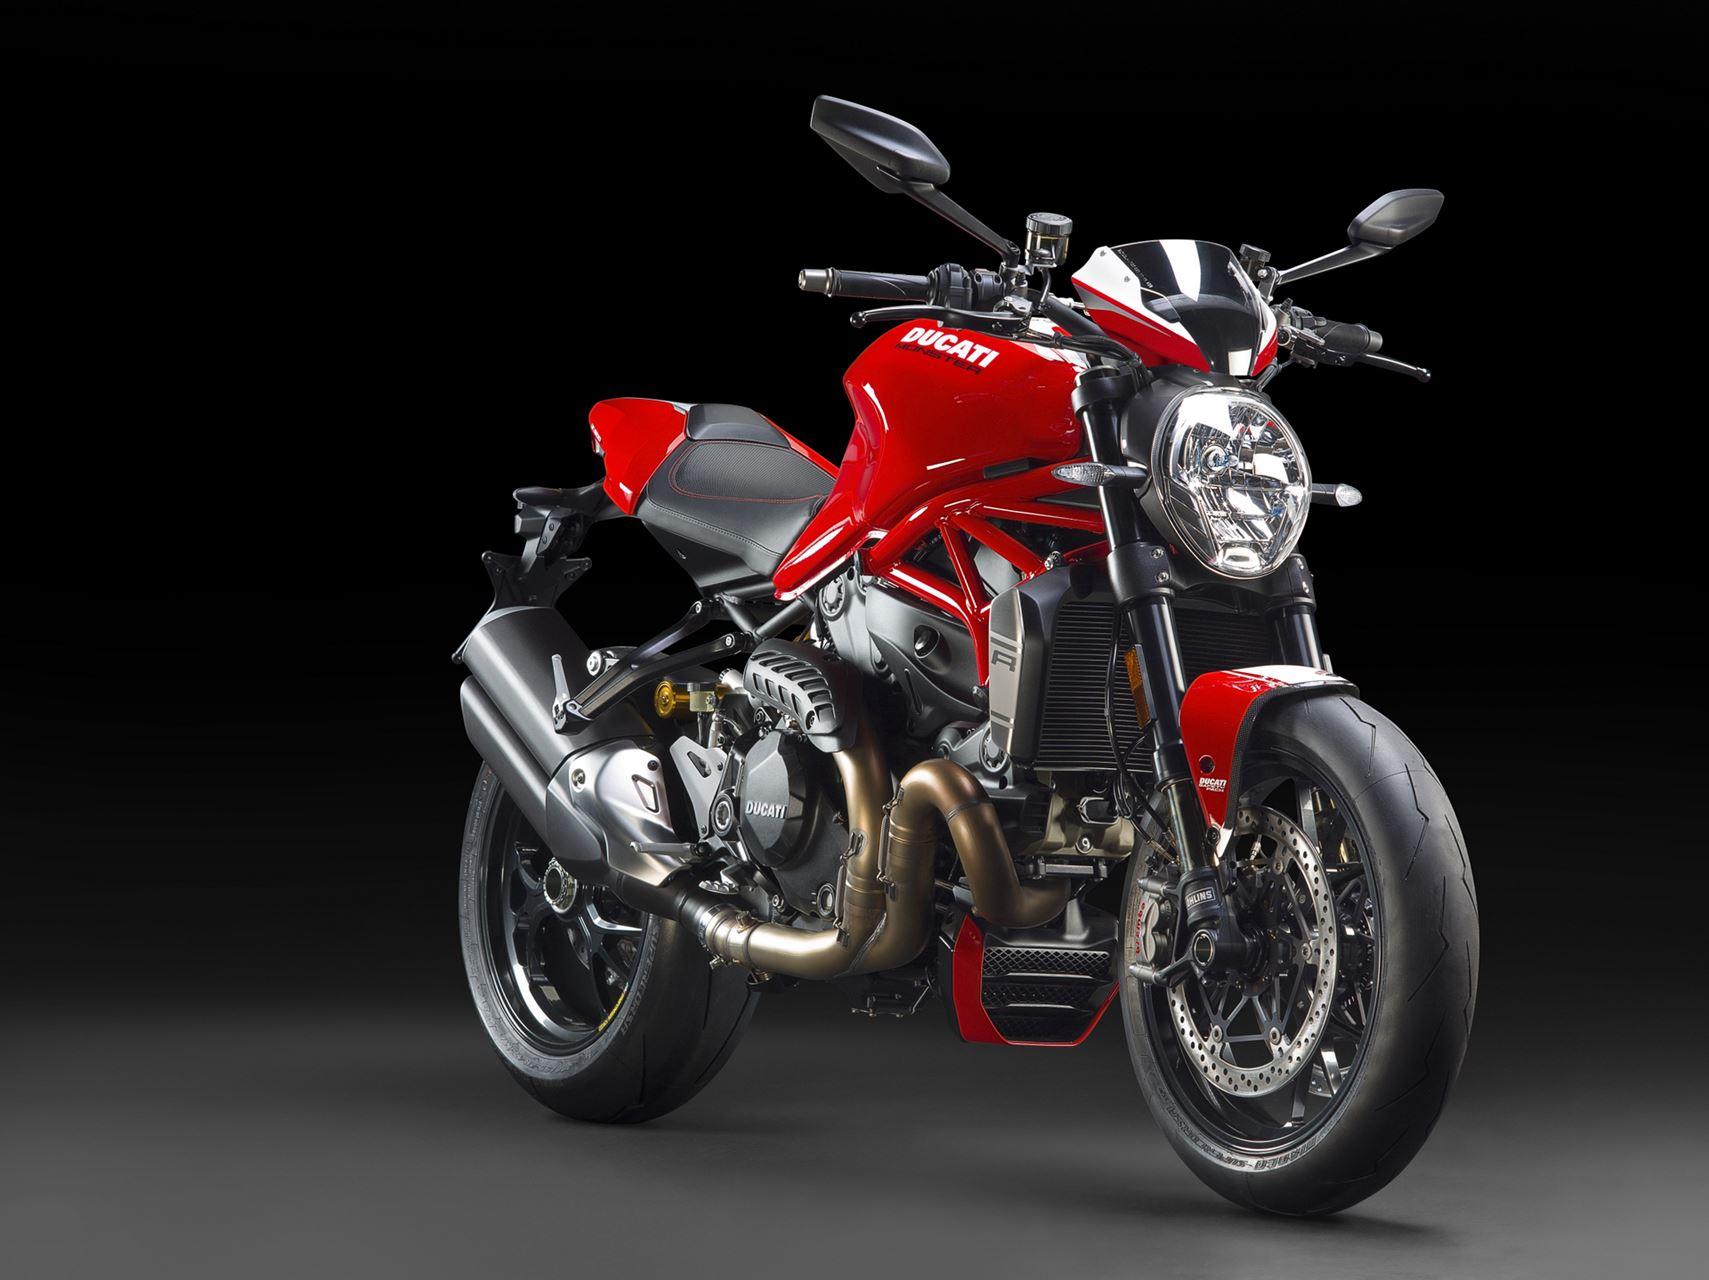 Ducati Superquadro Vs Testastretta